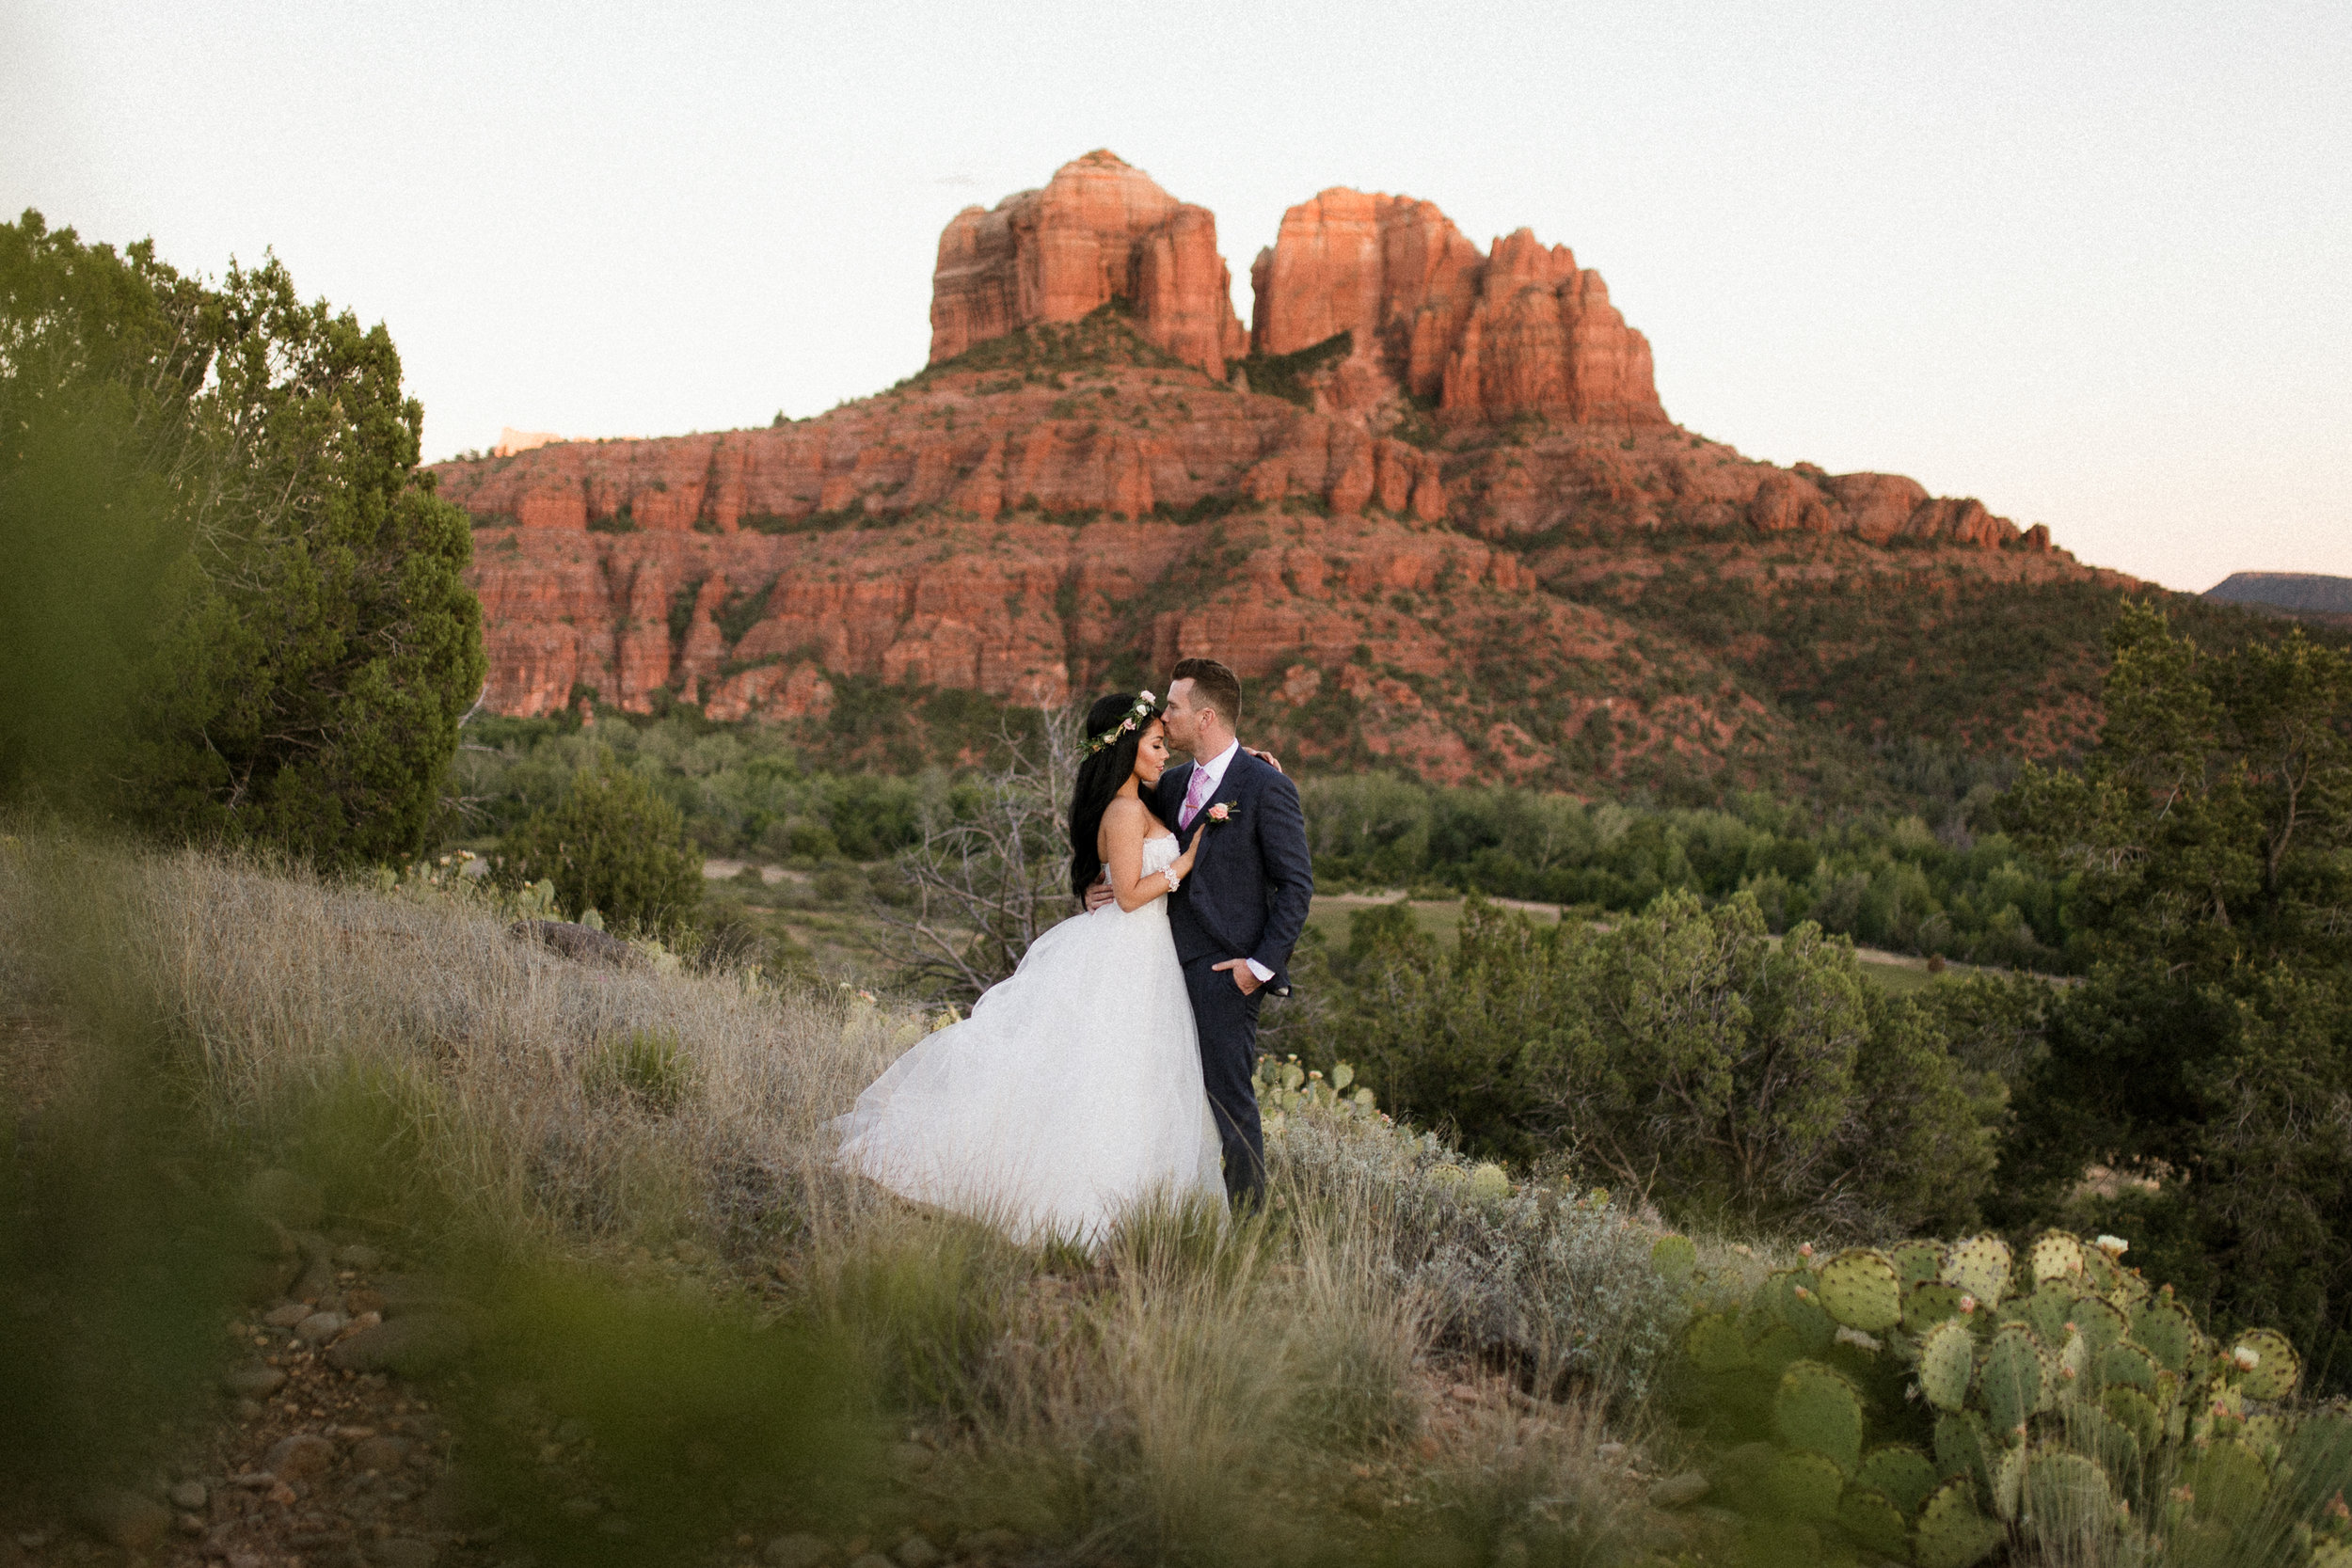 LMW-Sedona-lauberge-wedding-8336.jpg